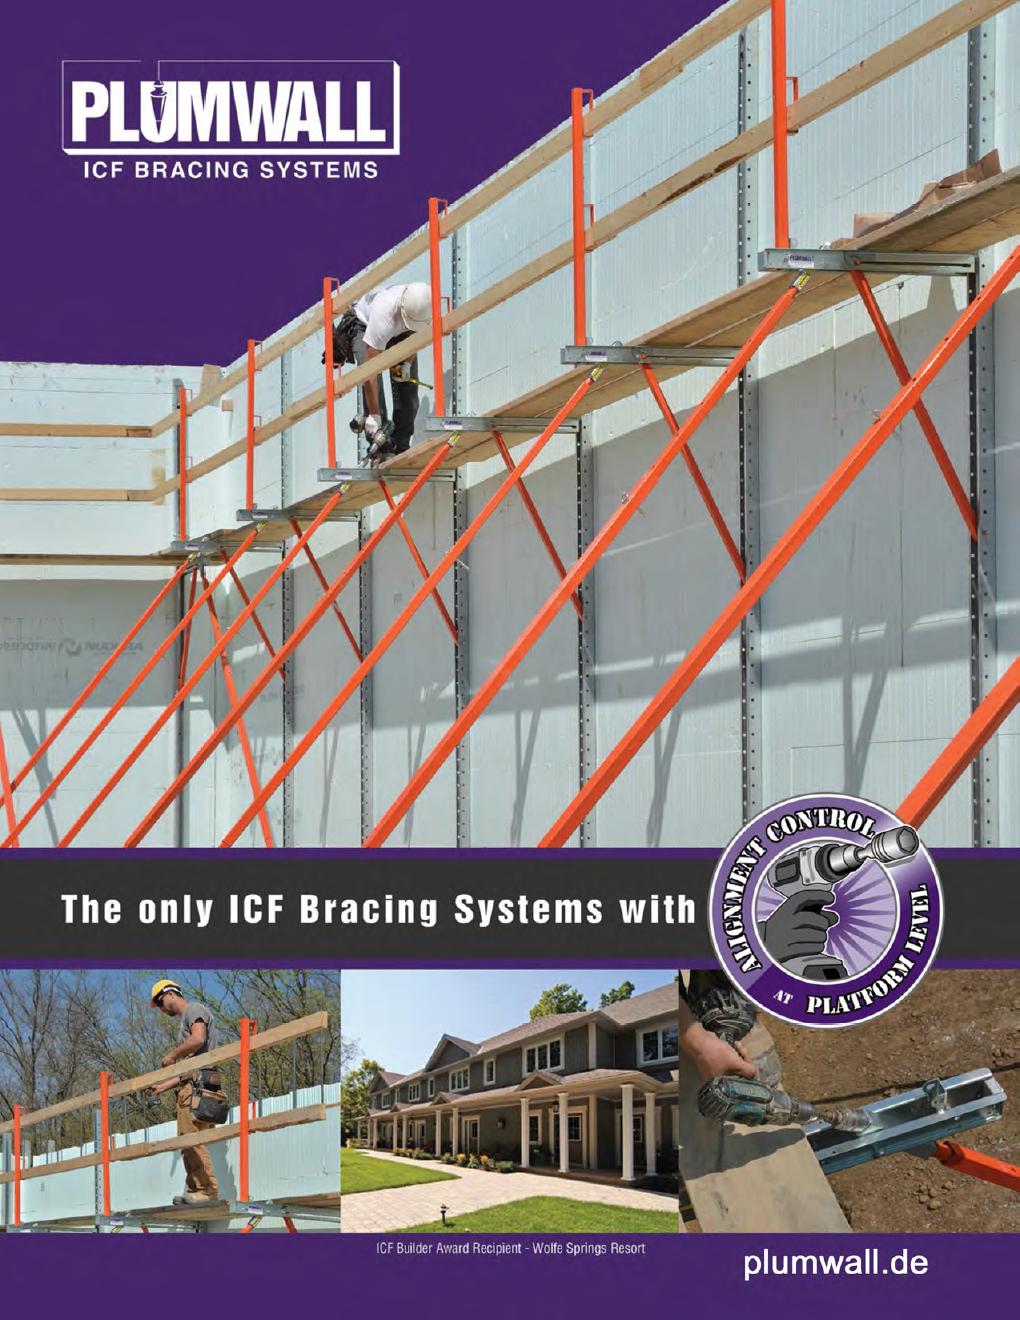 Plumbwall ICF Bracing Systems